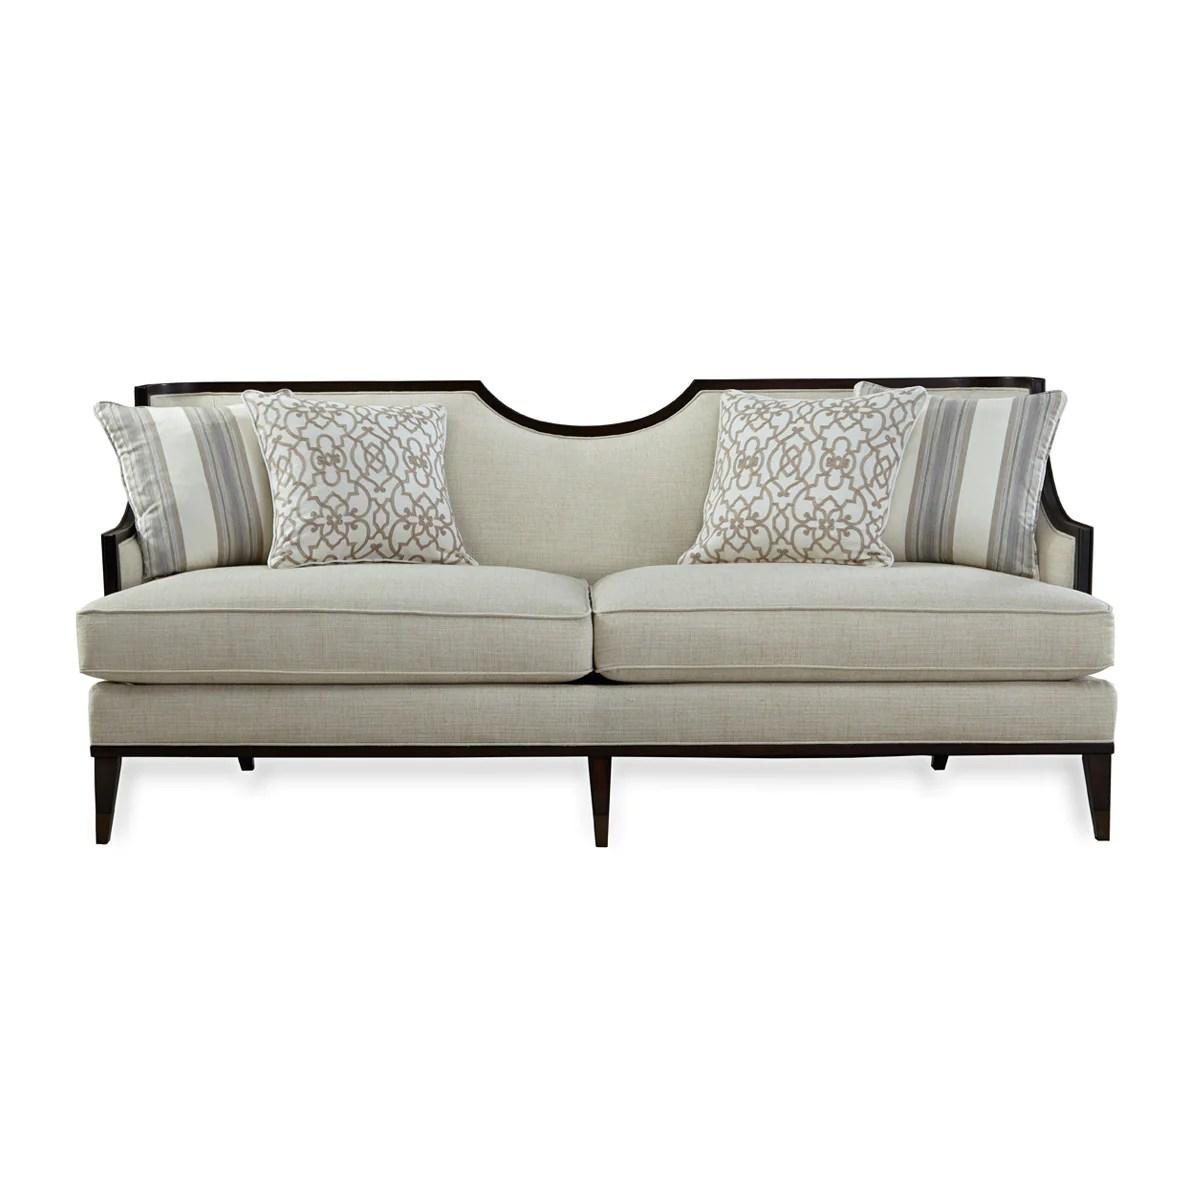 barletta sofa build